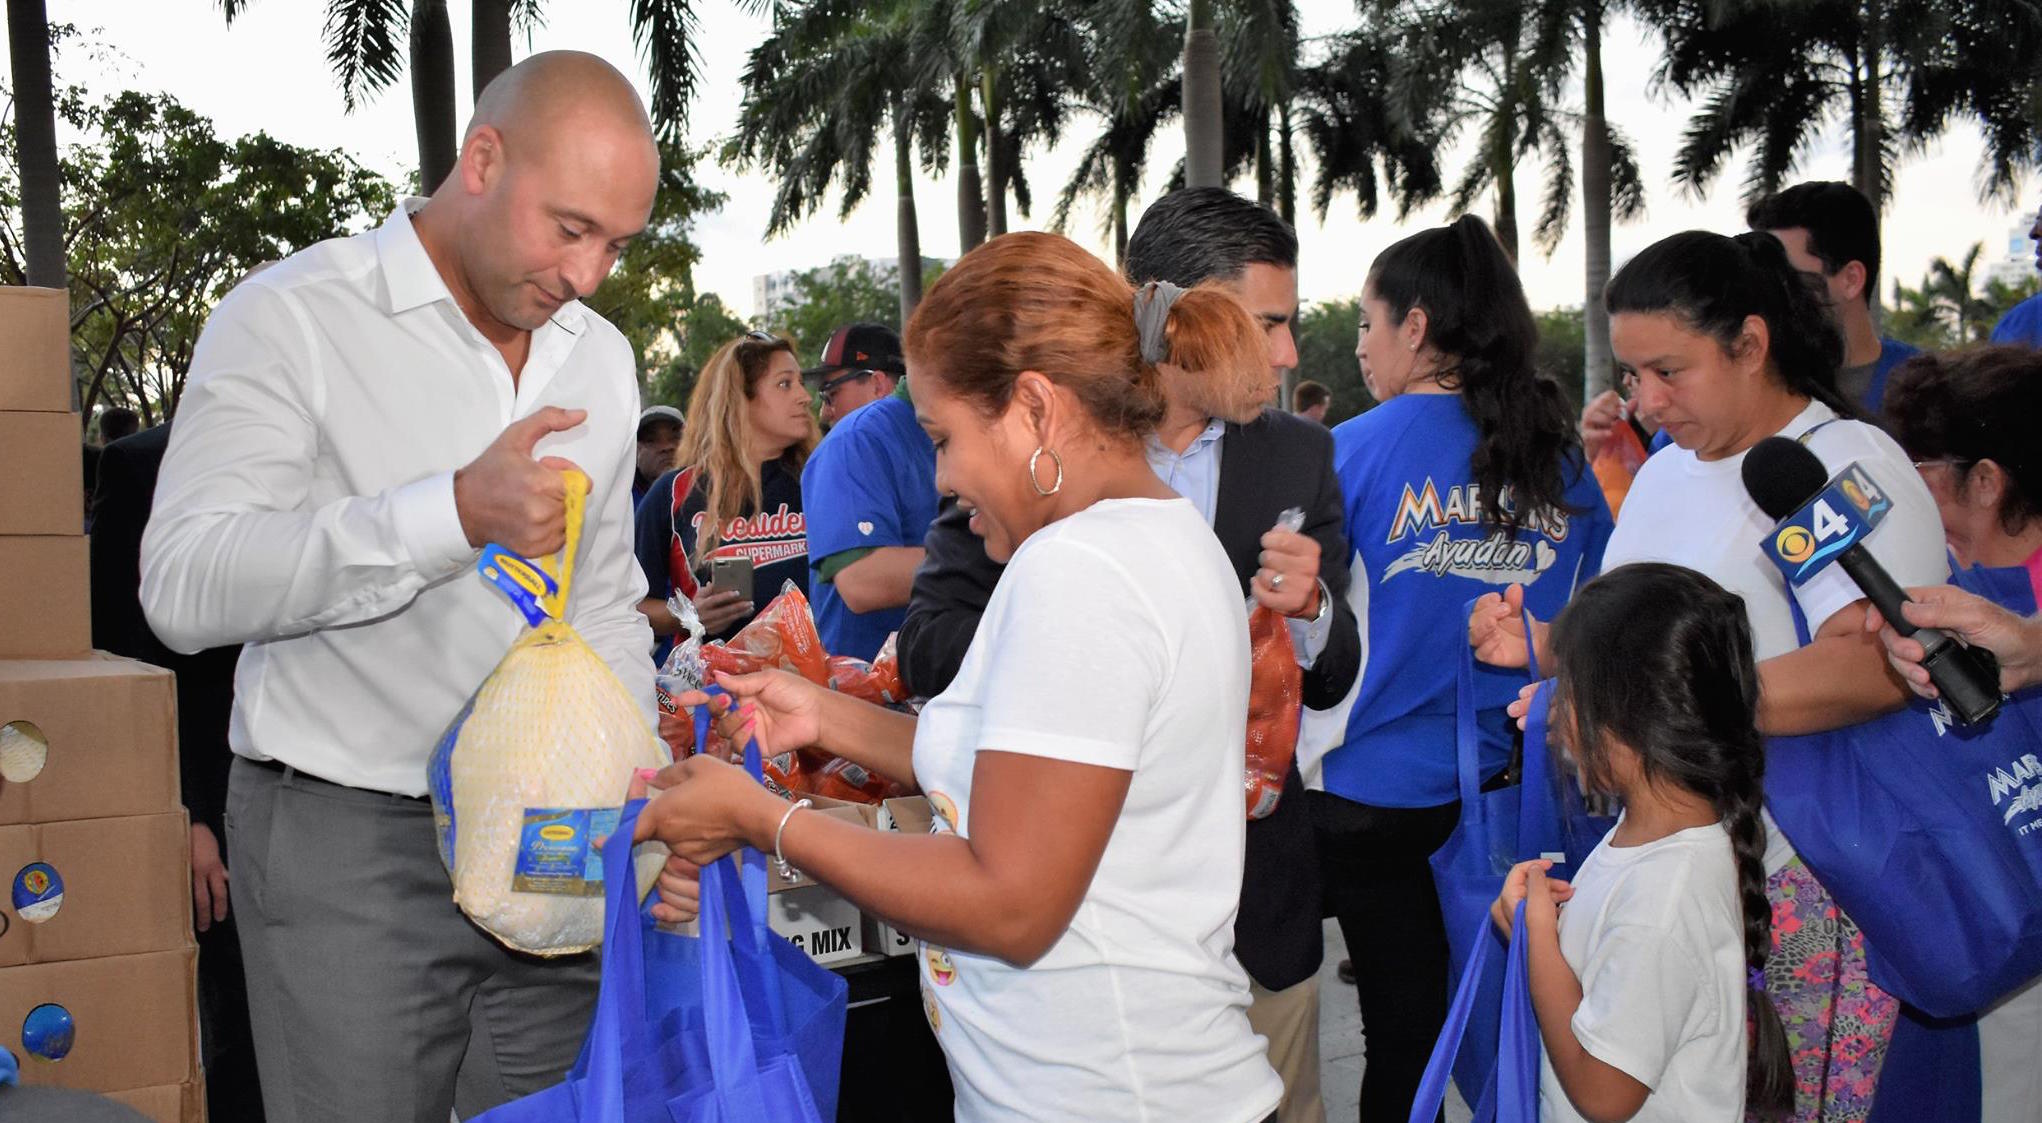 Derek Jeter Announces Marlins Will Donate $200,000 to Hurricane Relief